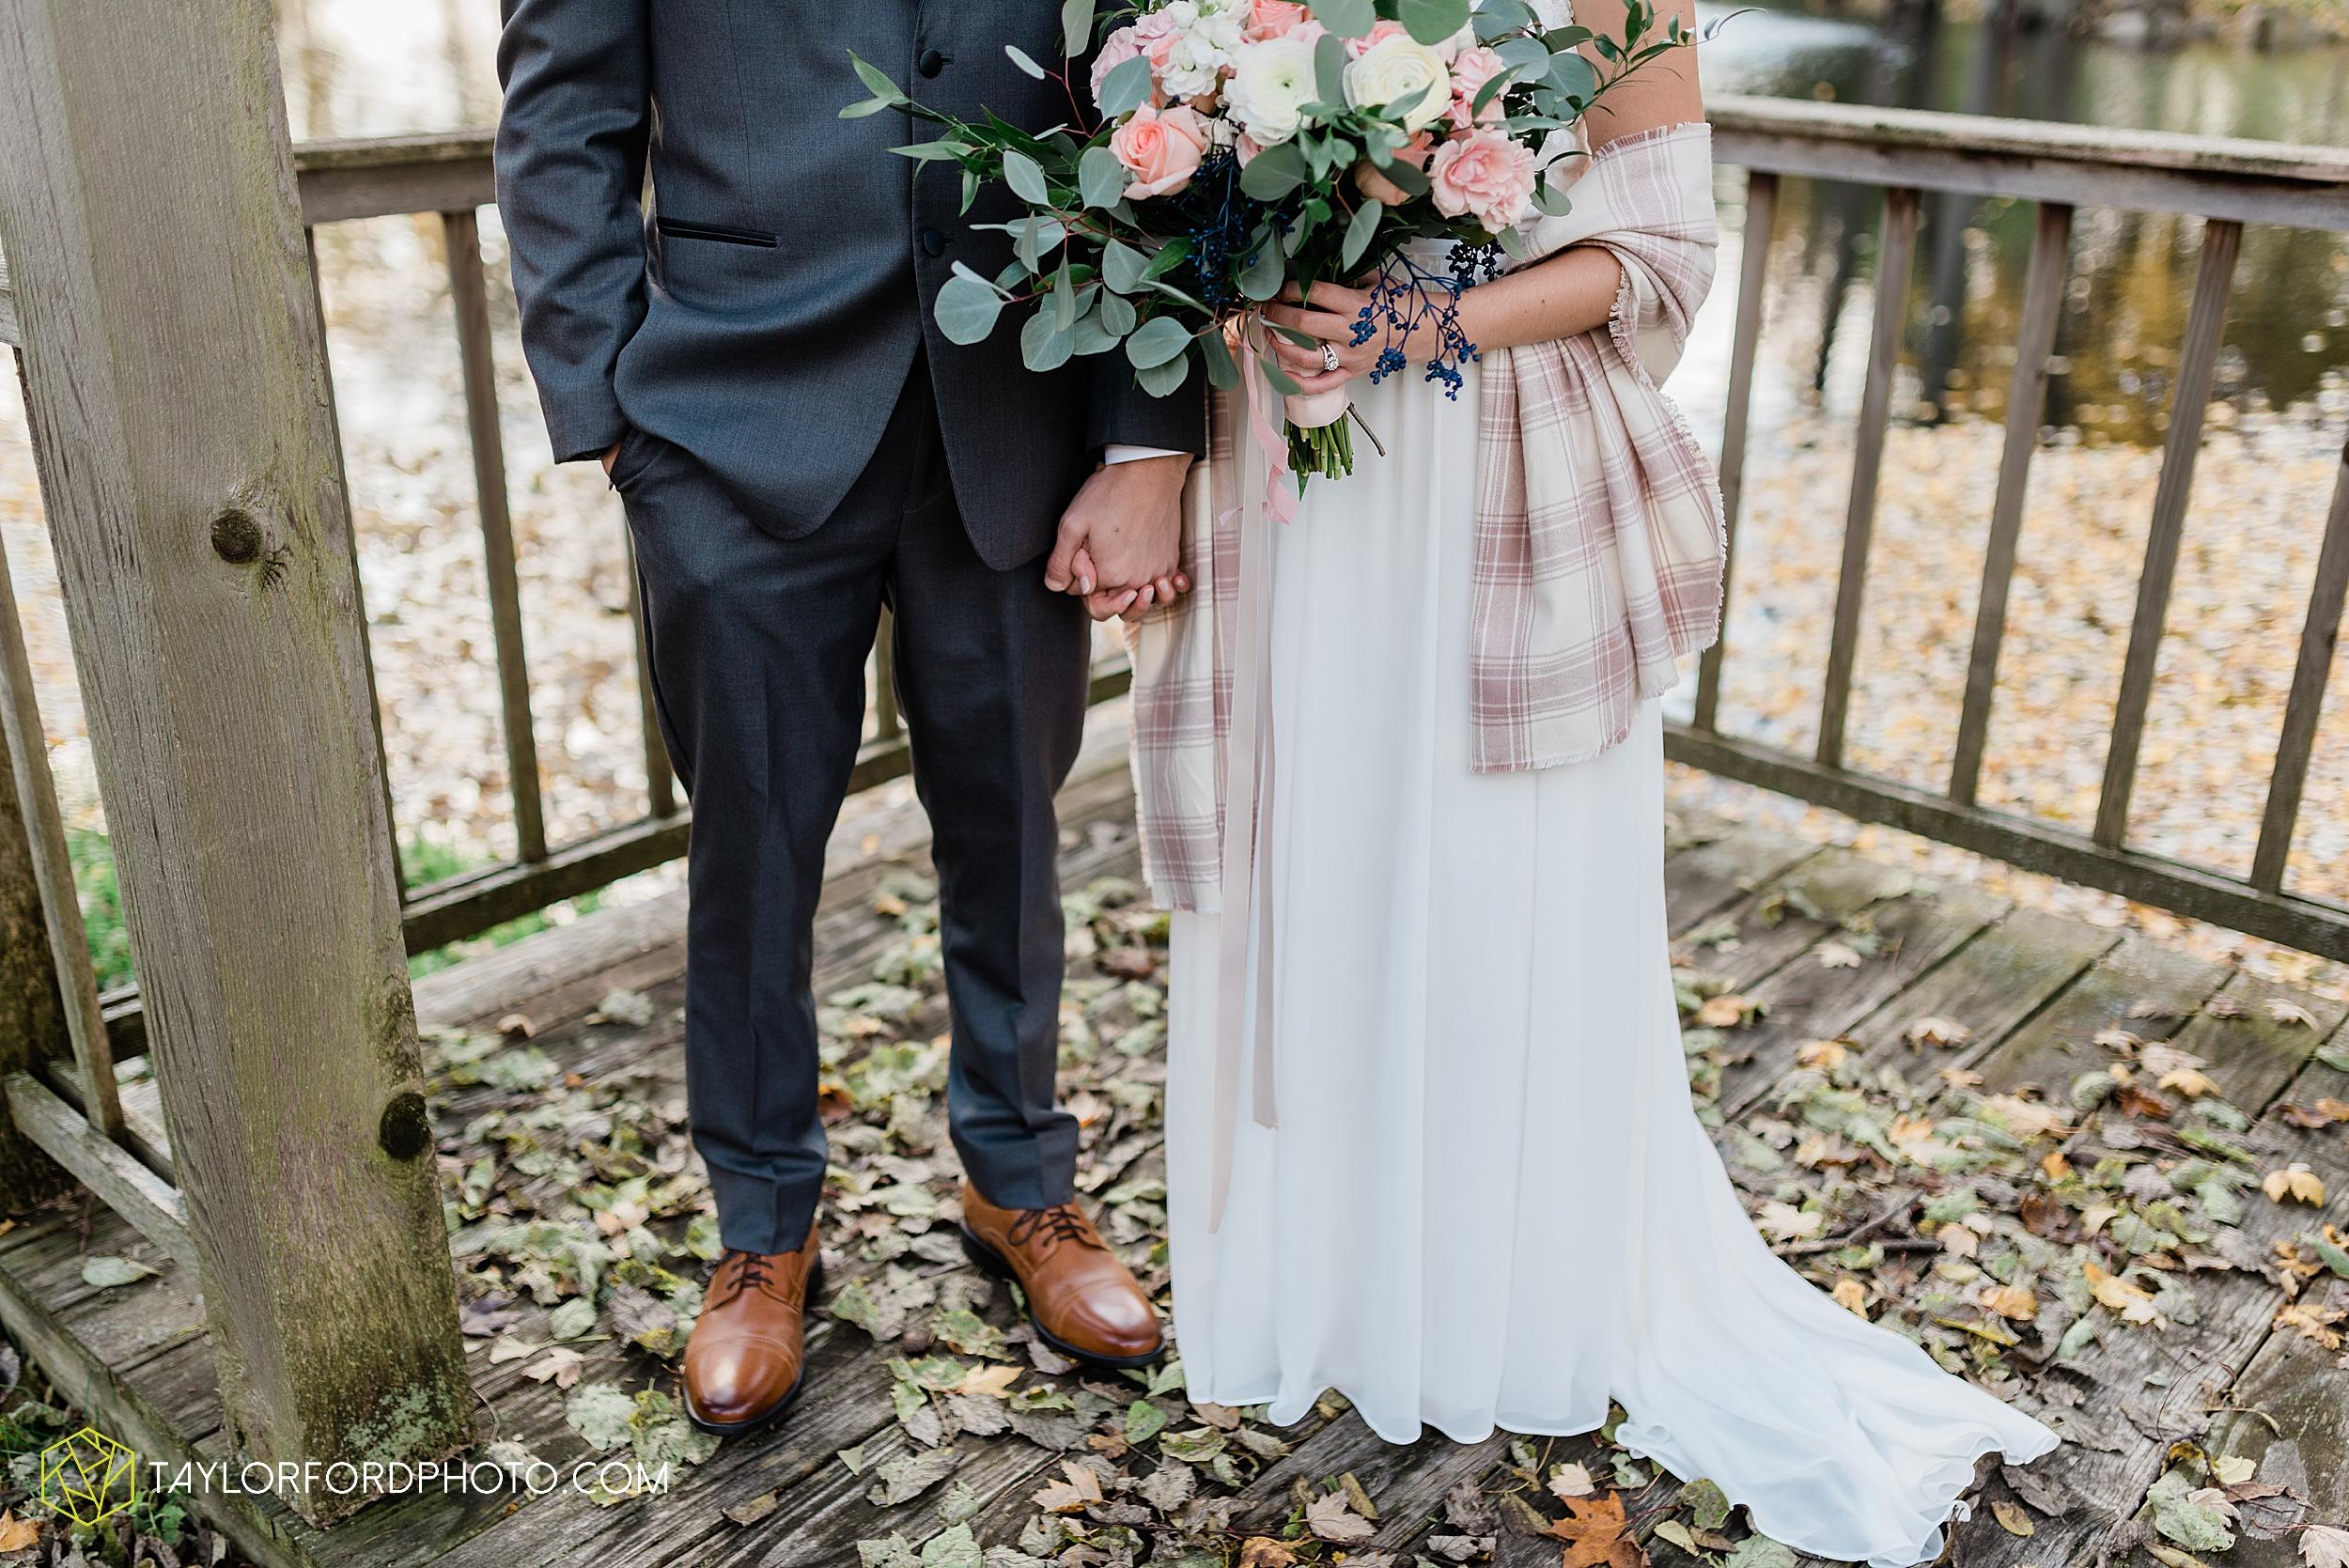 marissa-nicole-nick-daeger-orrmont-estate-farm-wedding-piqua-dayton-troy-ohio-fall-photographer-taylor-ford-photography_1510.jpg